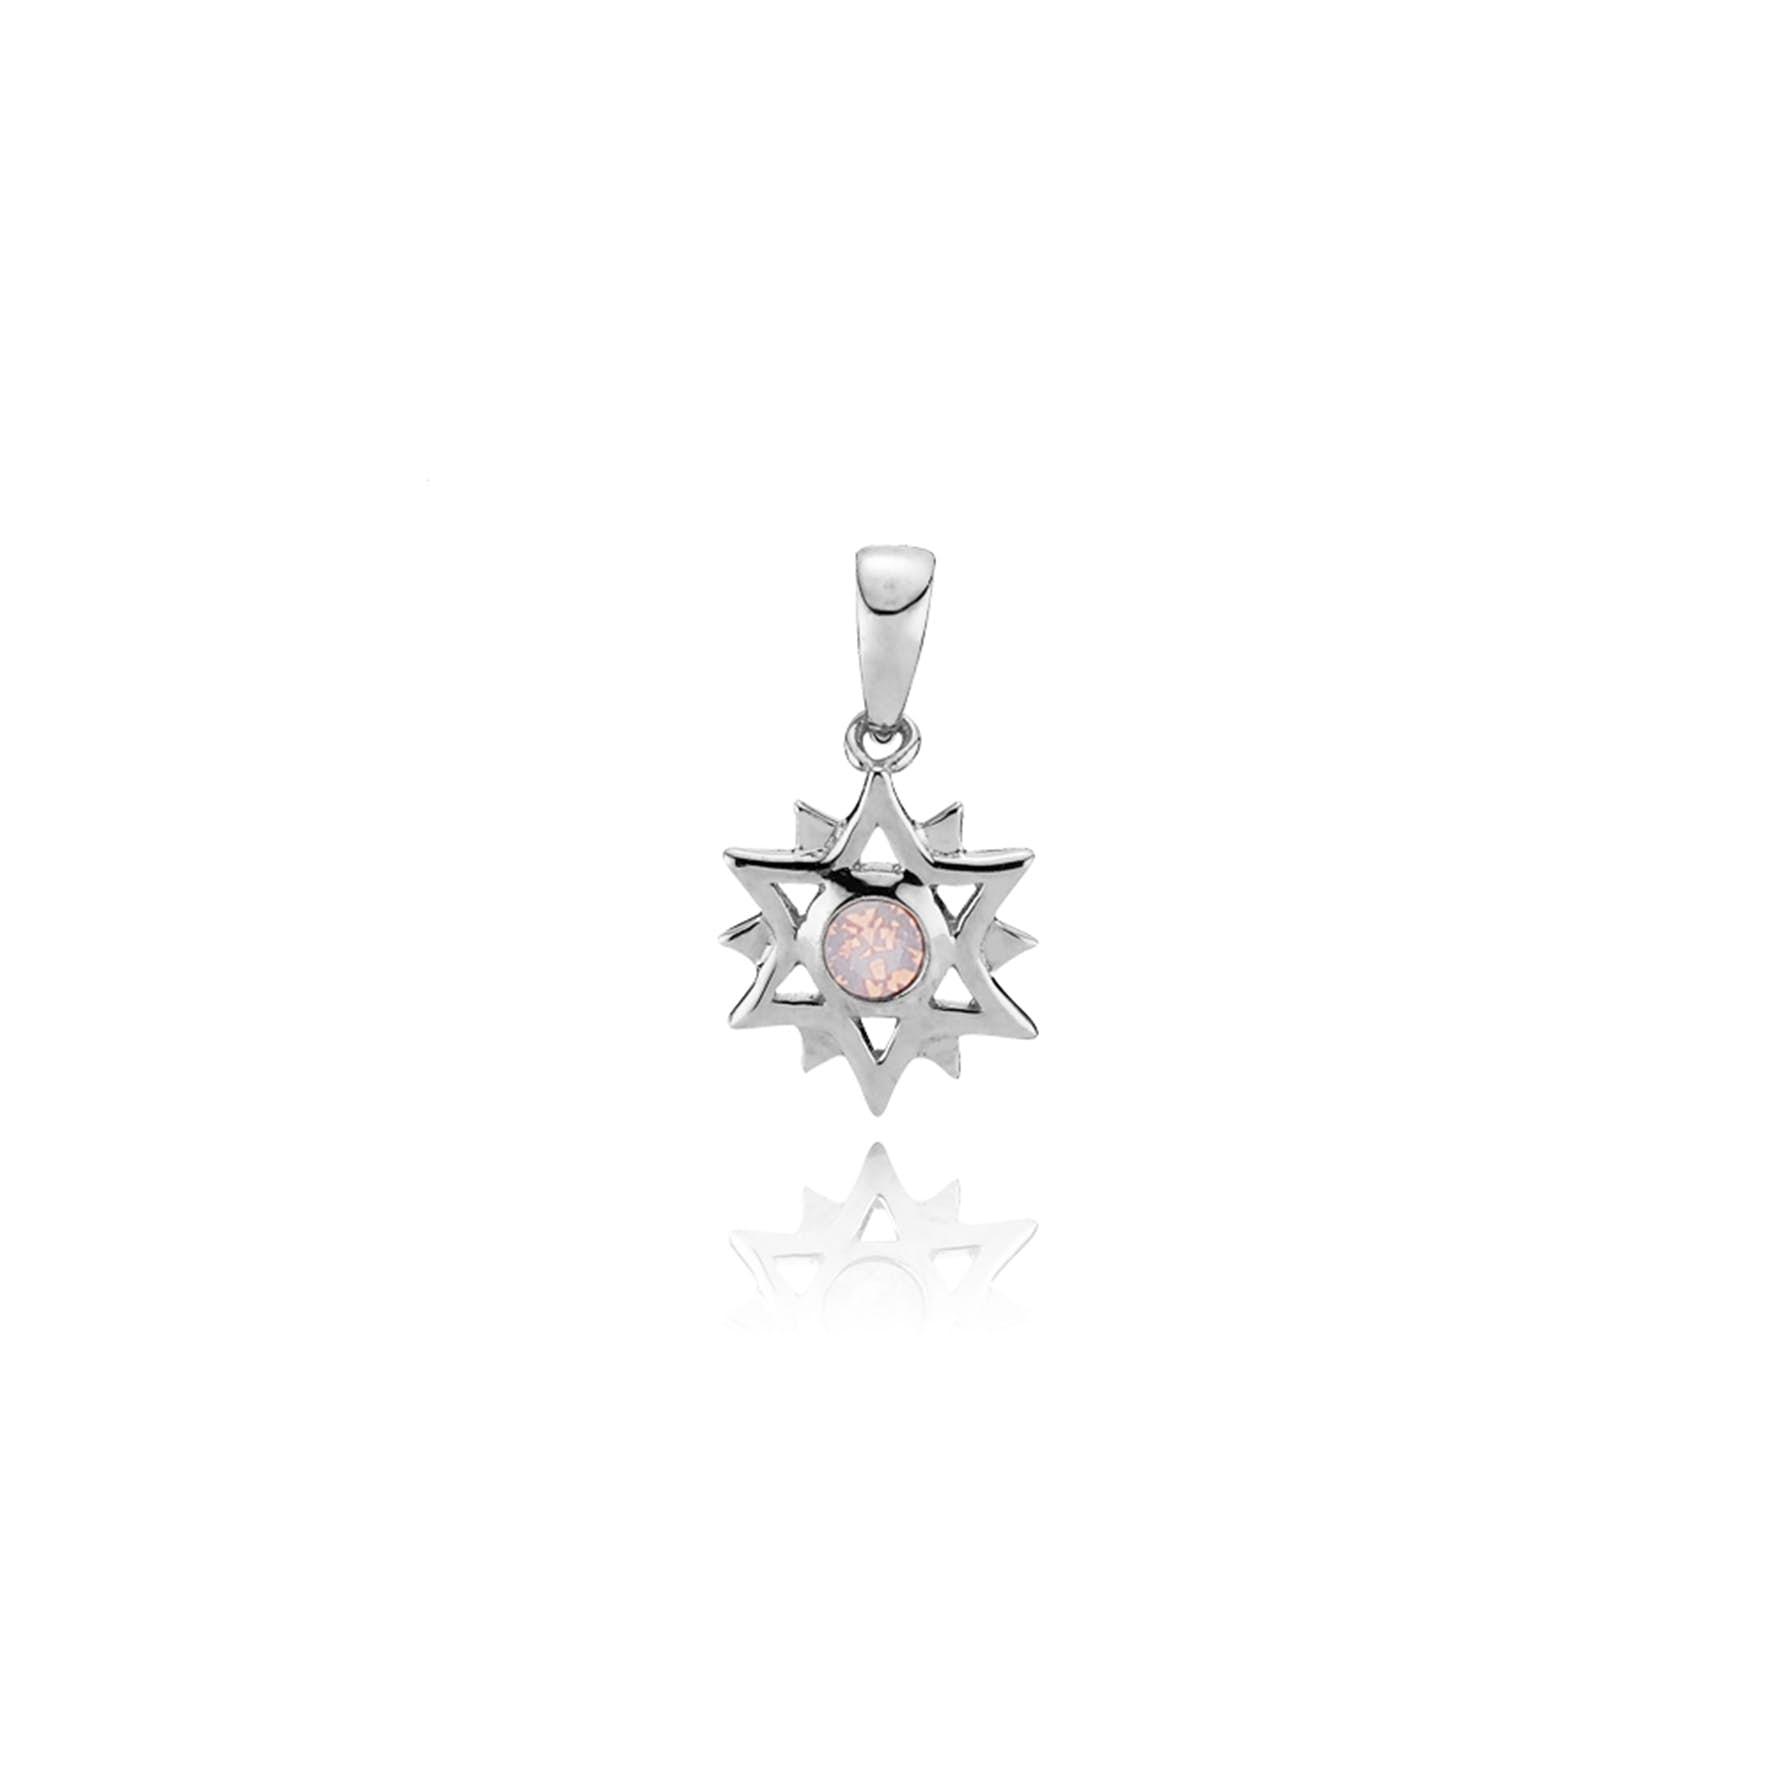 Olivia By Sistie Pendant Rose Opal fra Sistie i Sølv Sterling 925